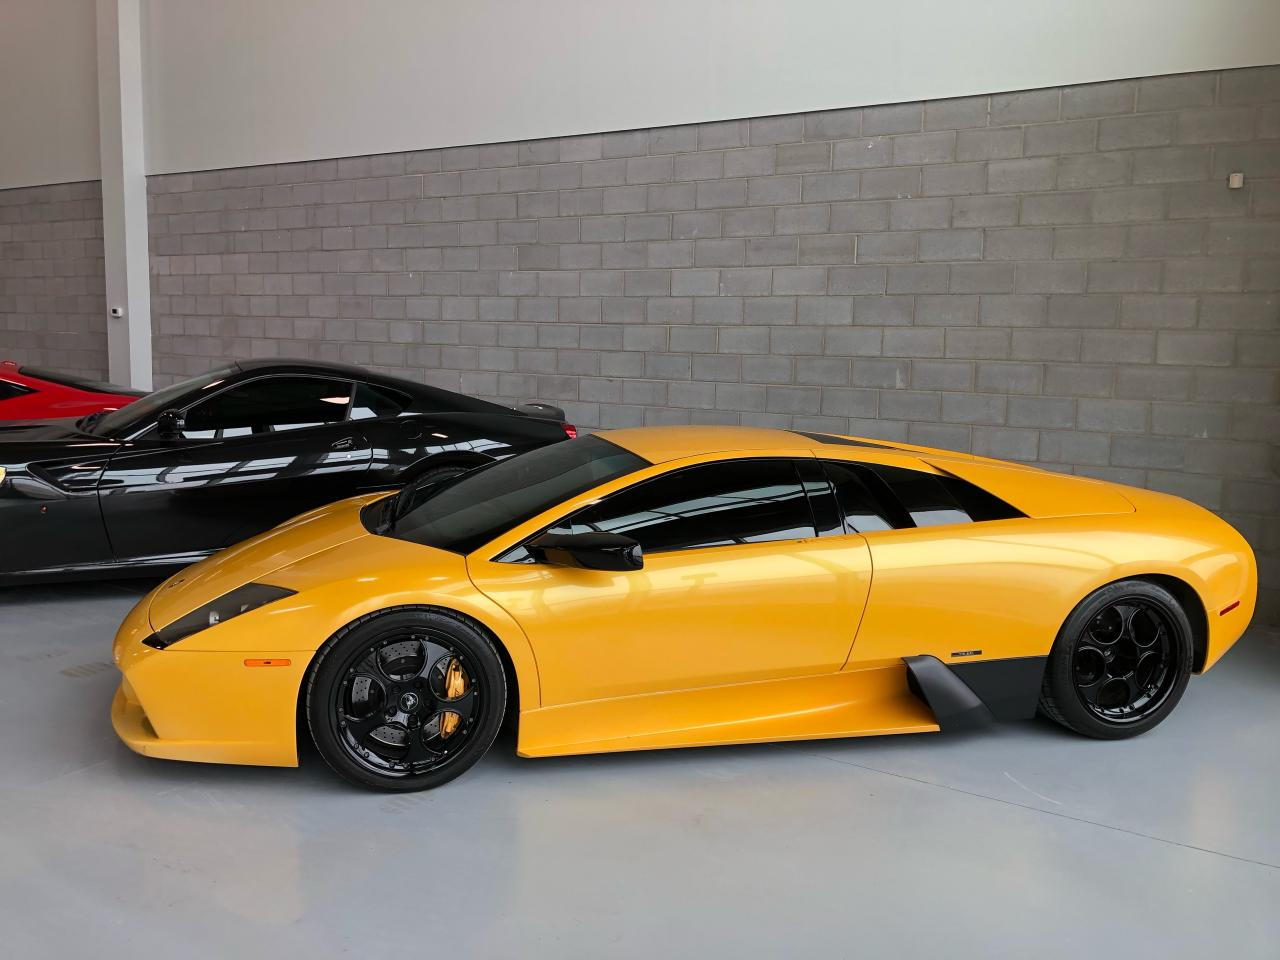 Photo of Yellow 2004 Lamborghini Murcielago